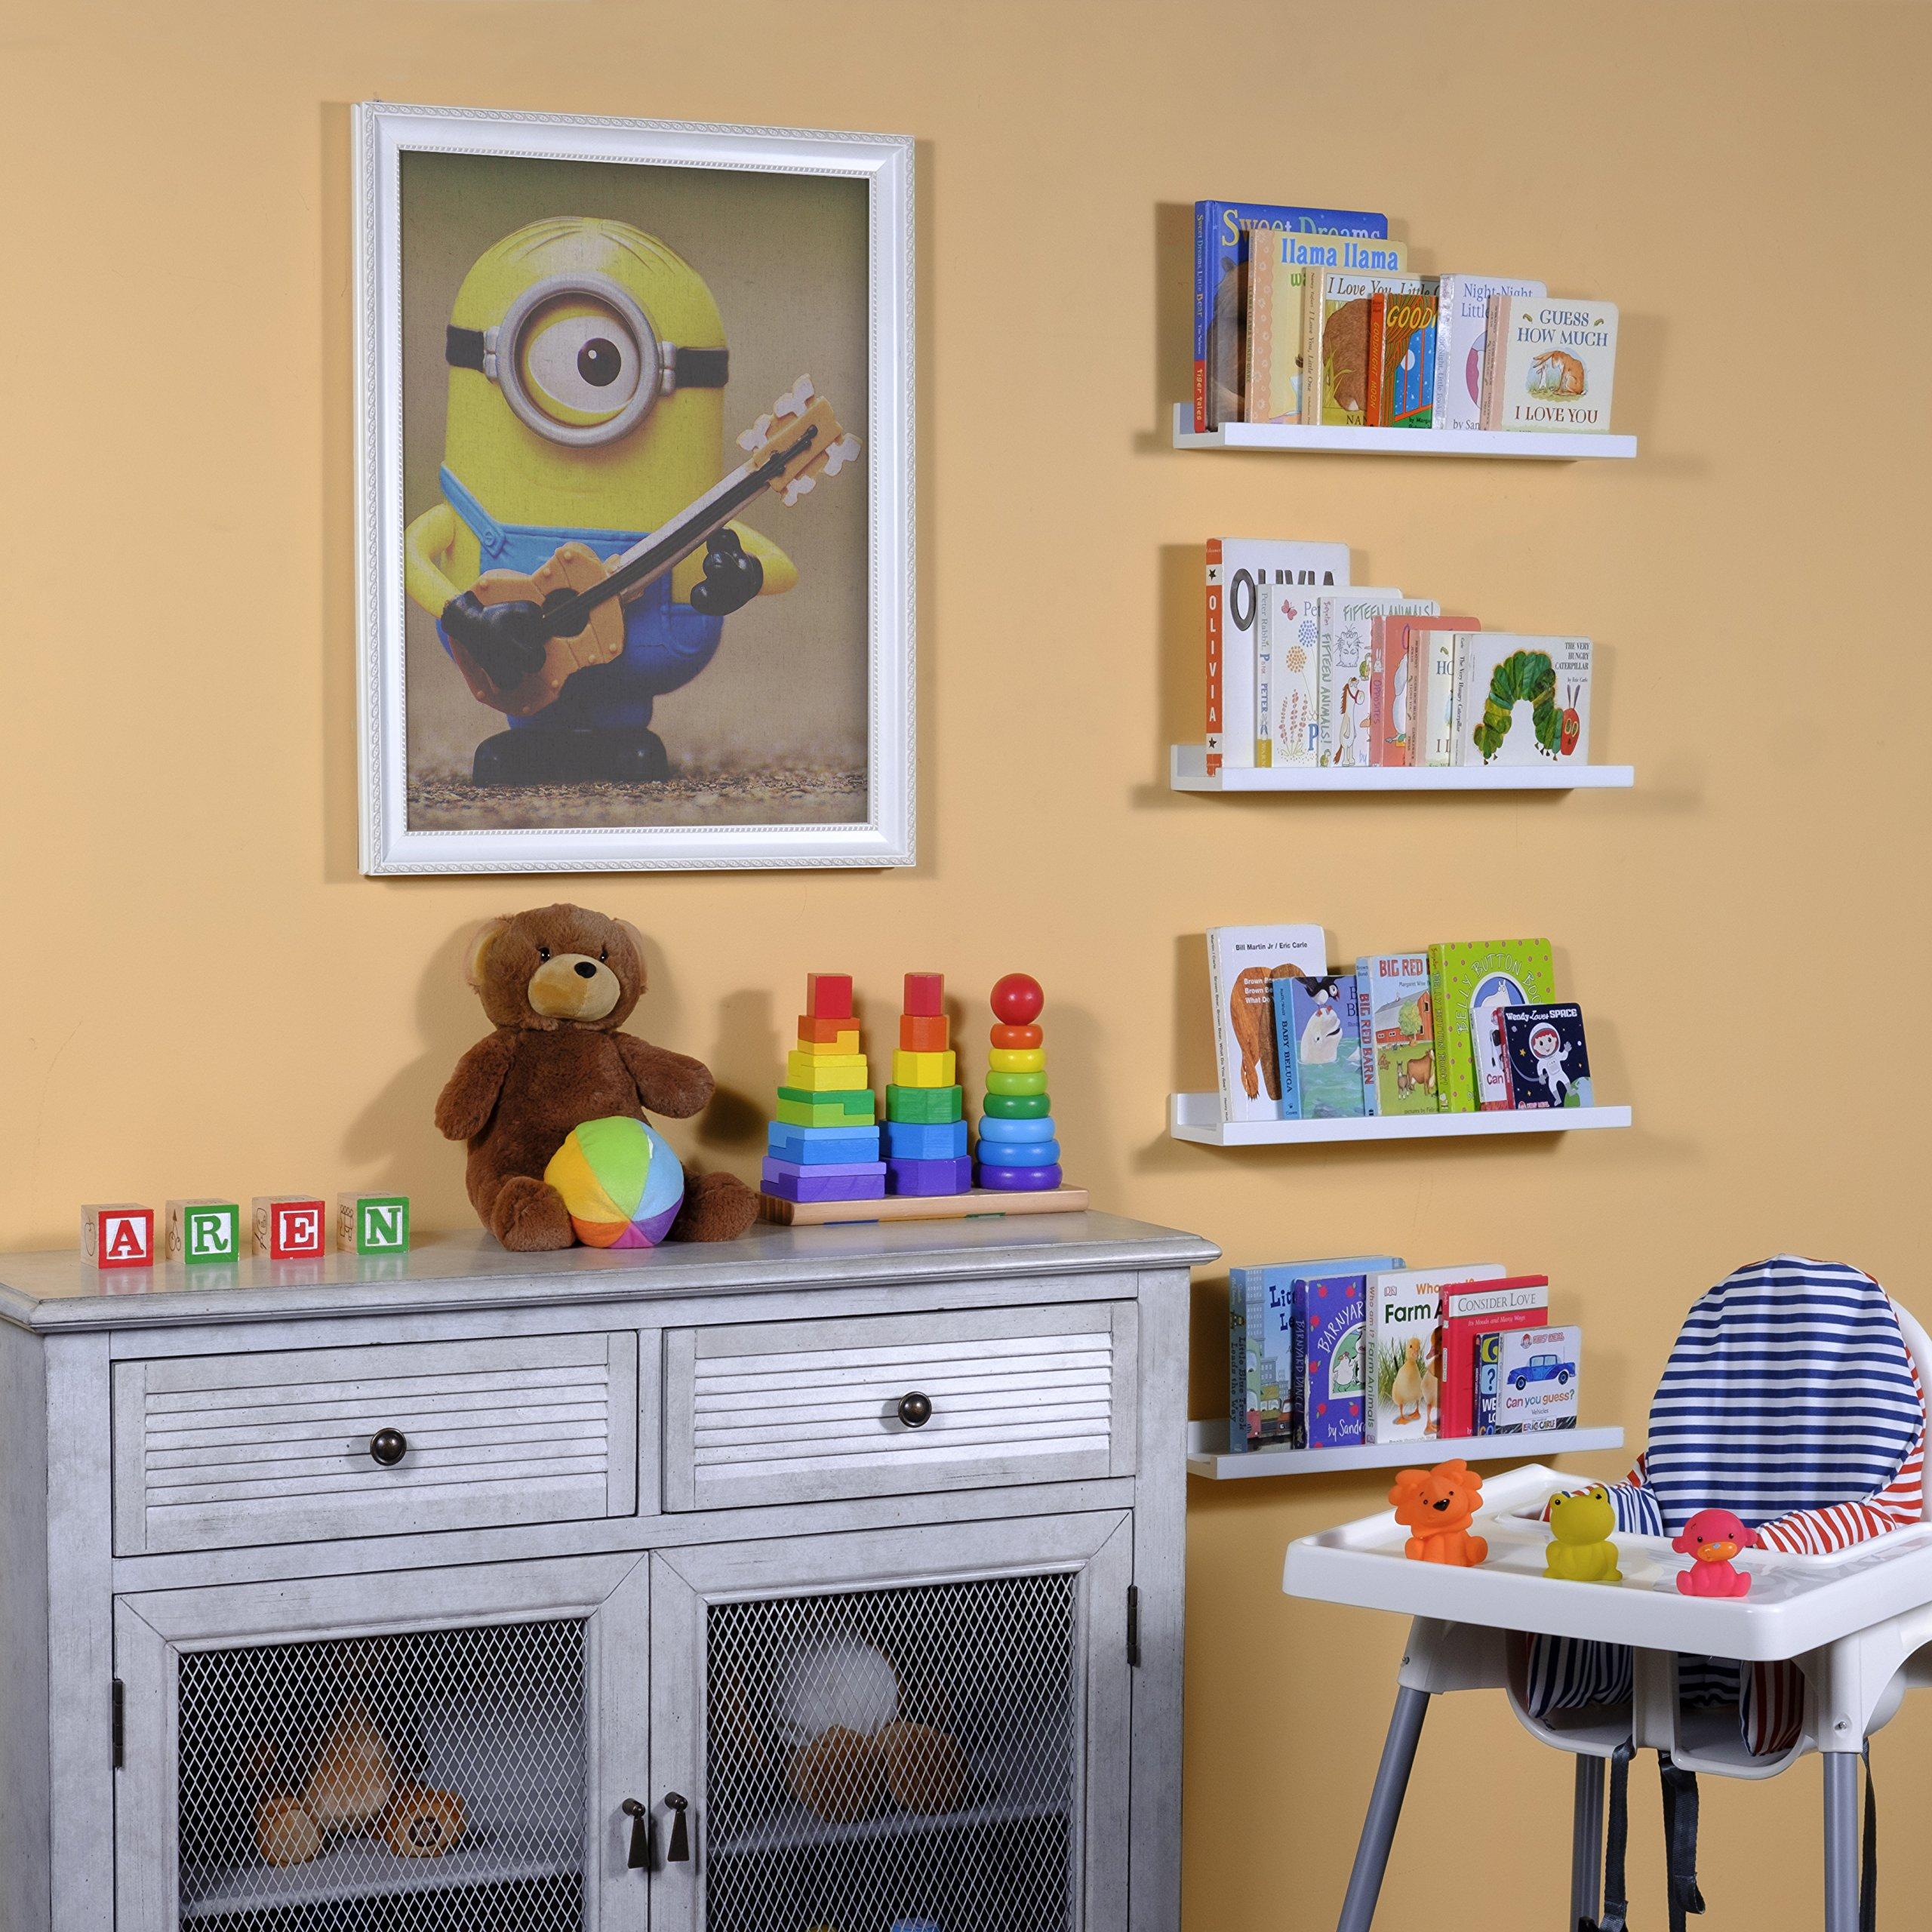 Wallniture Denver Wall Mounted Floating Shelves For Nursery Decor